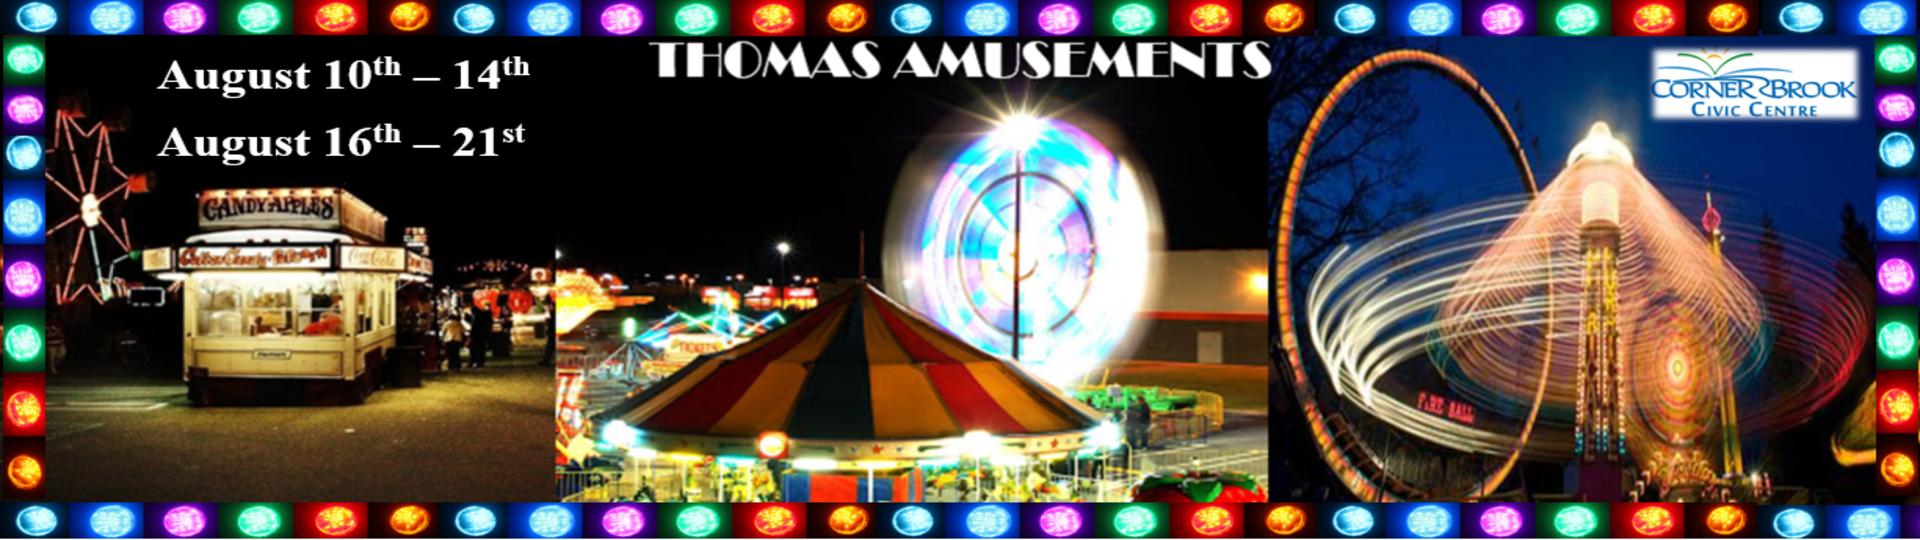 Corner Brook Thomas Amusements!